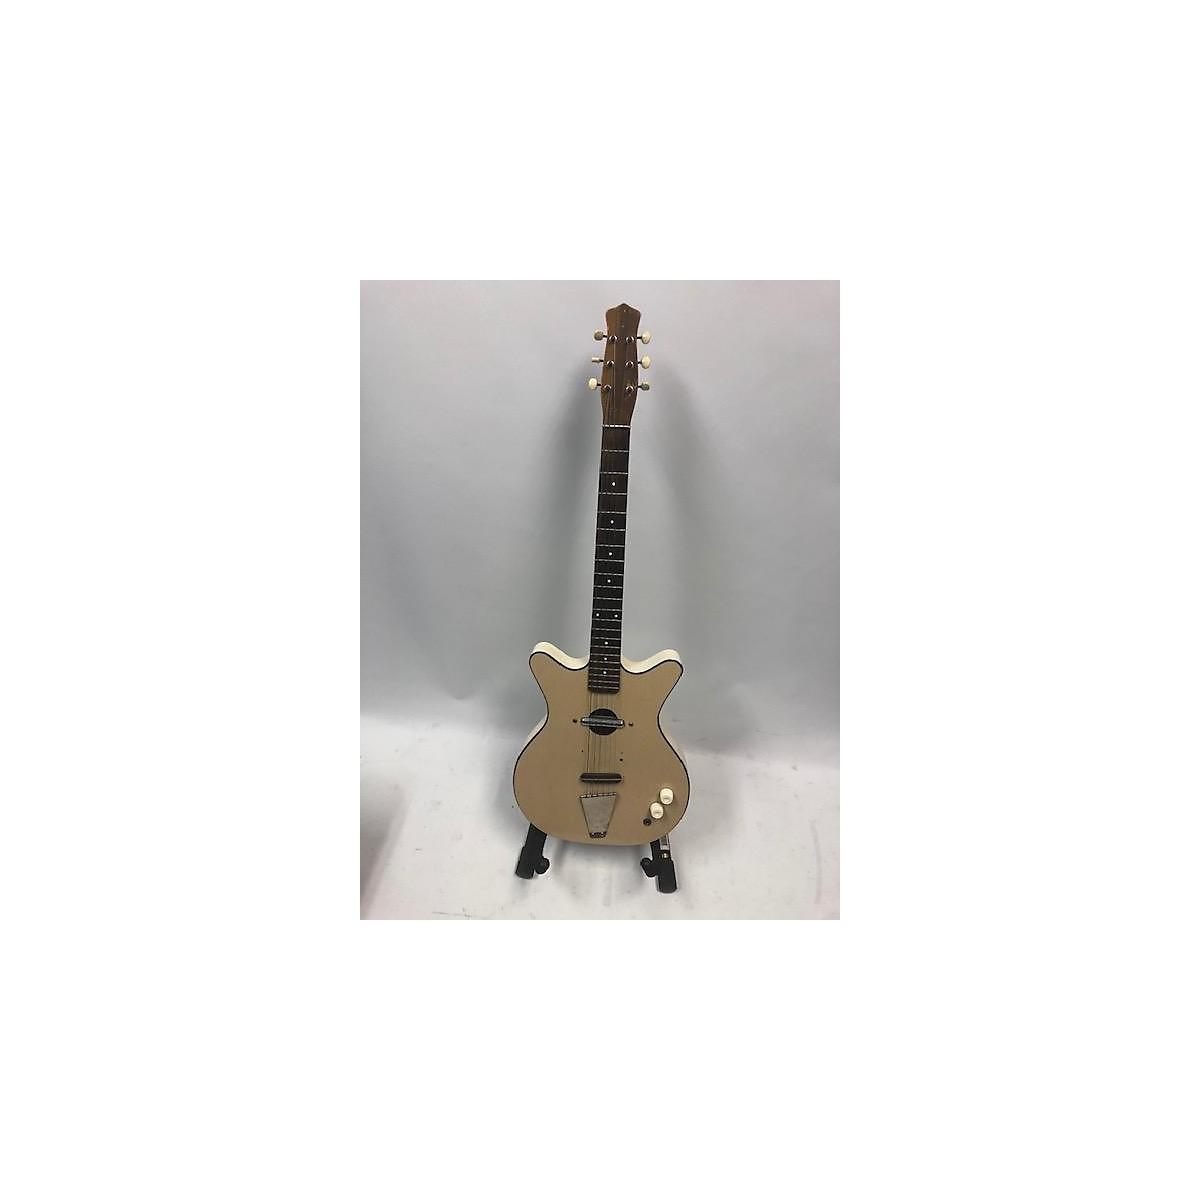 Danelectro 1960s Convertible Acoustic Electric Guitar